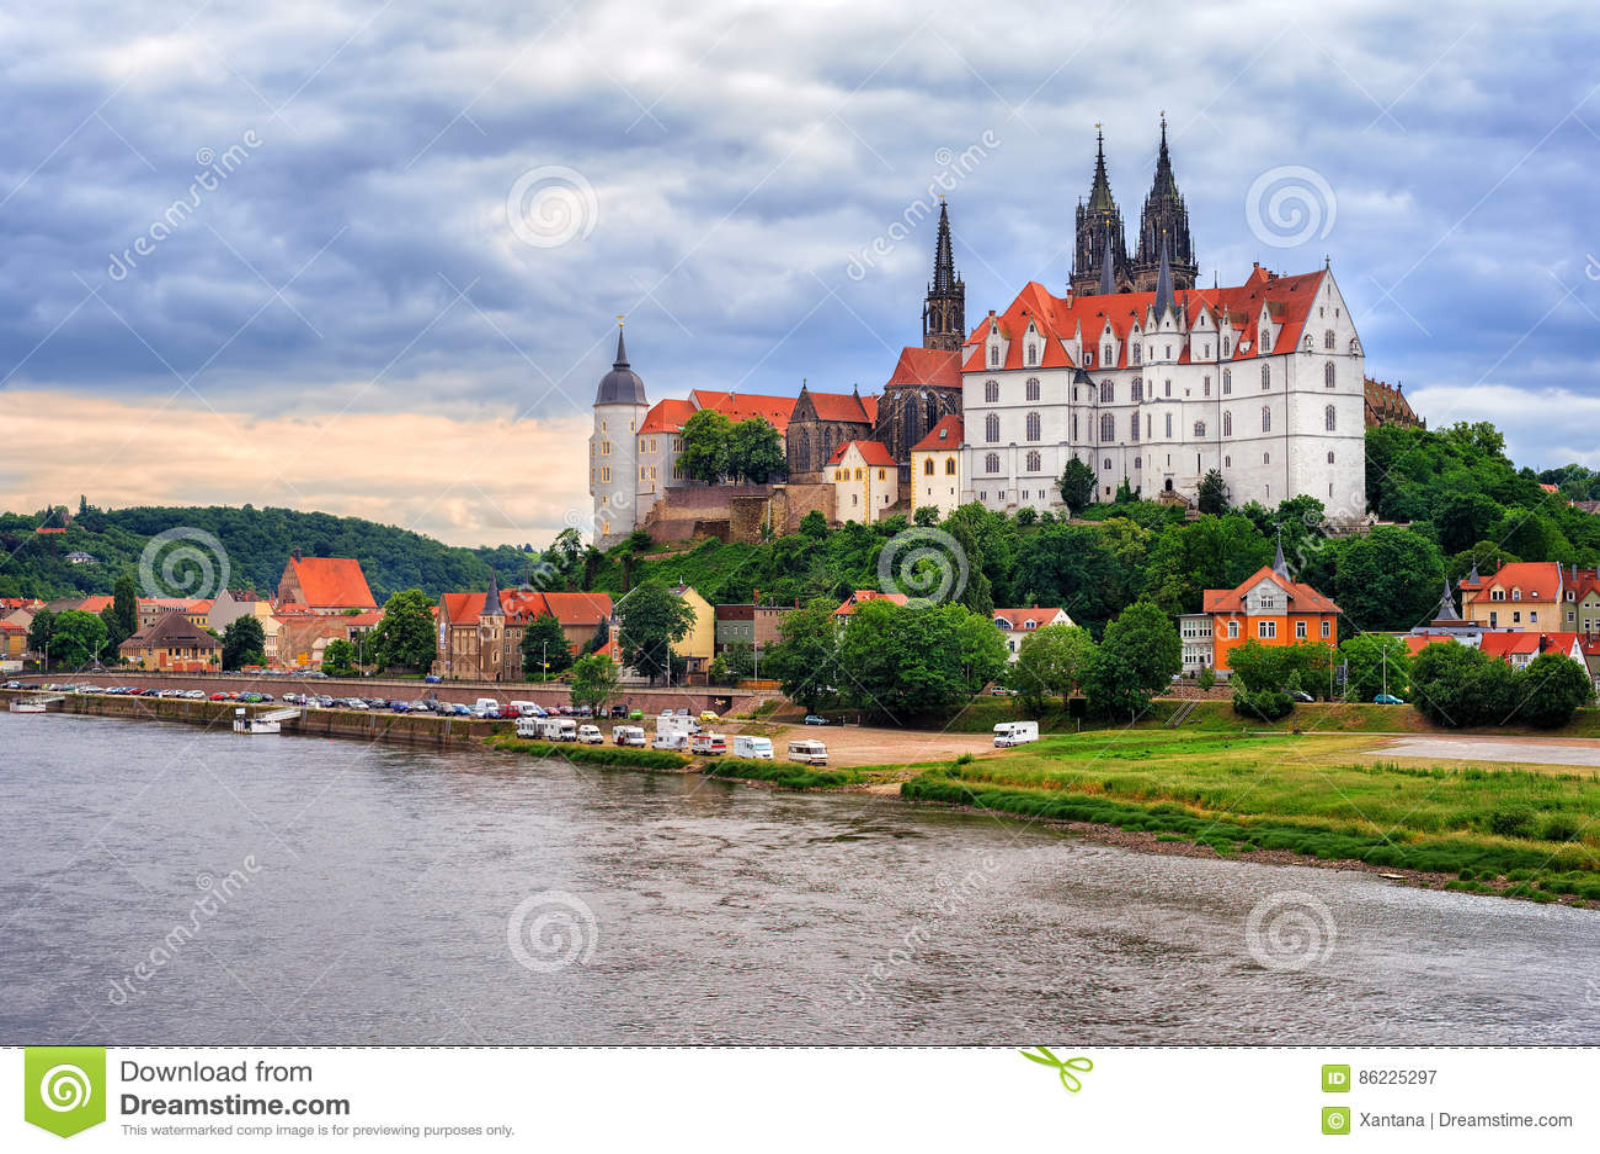 Meissen oude stad met kasteel en kathedraal, Duitsland